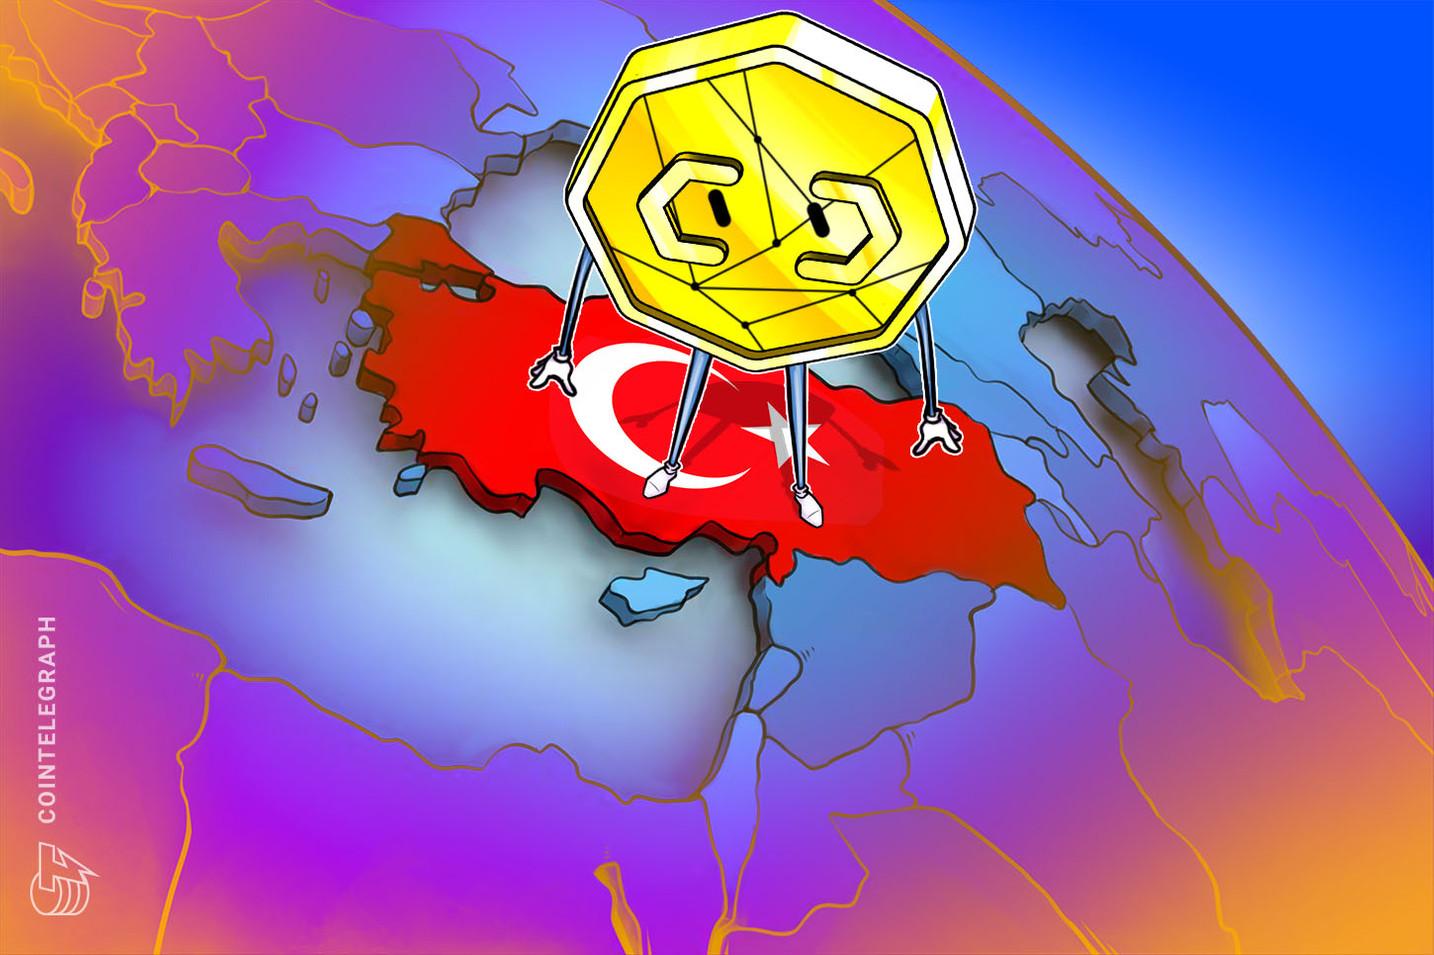 Turski kripto račun spreman za parlament, kaže zamjenik ministra financija